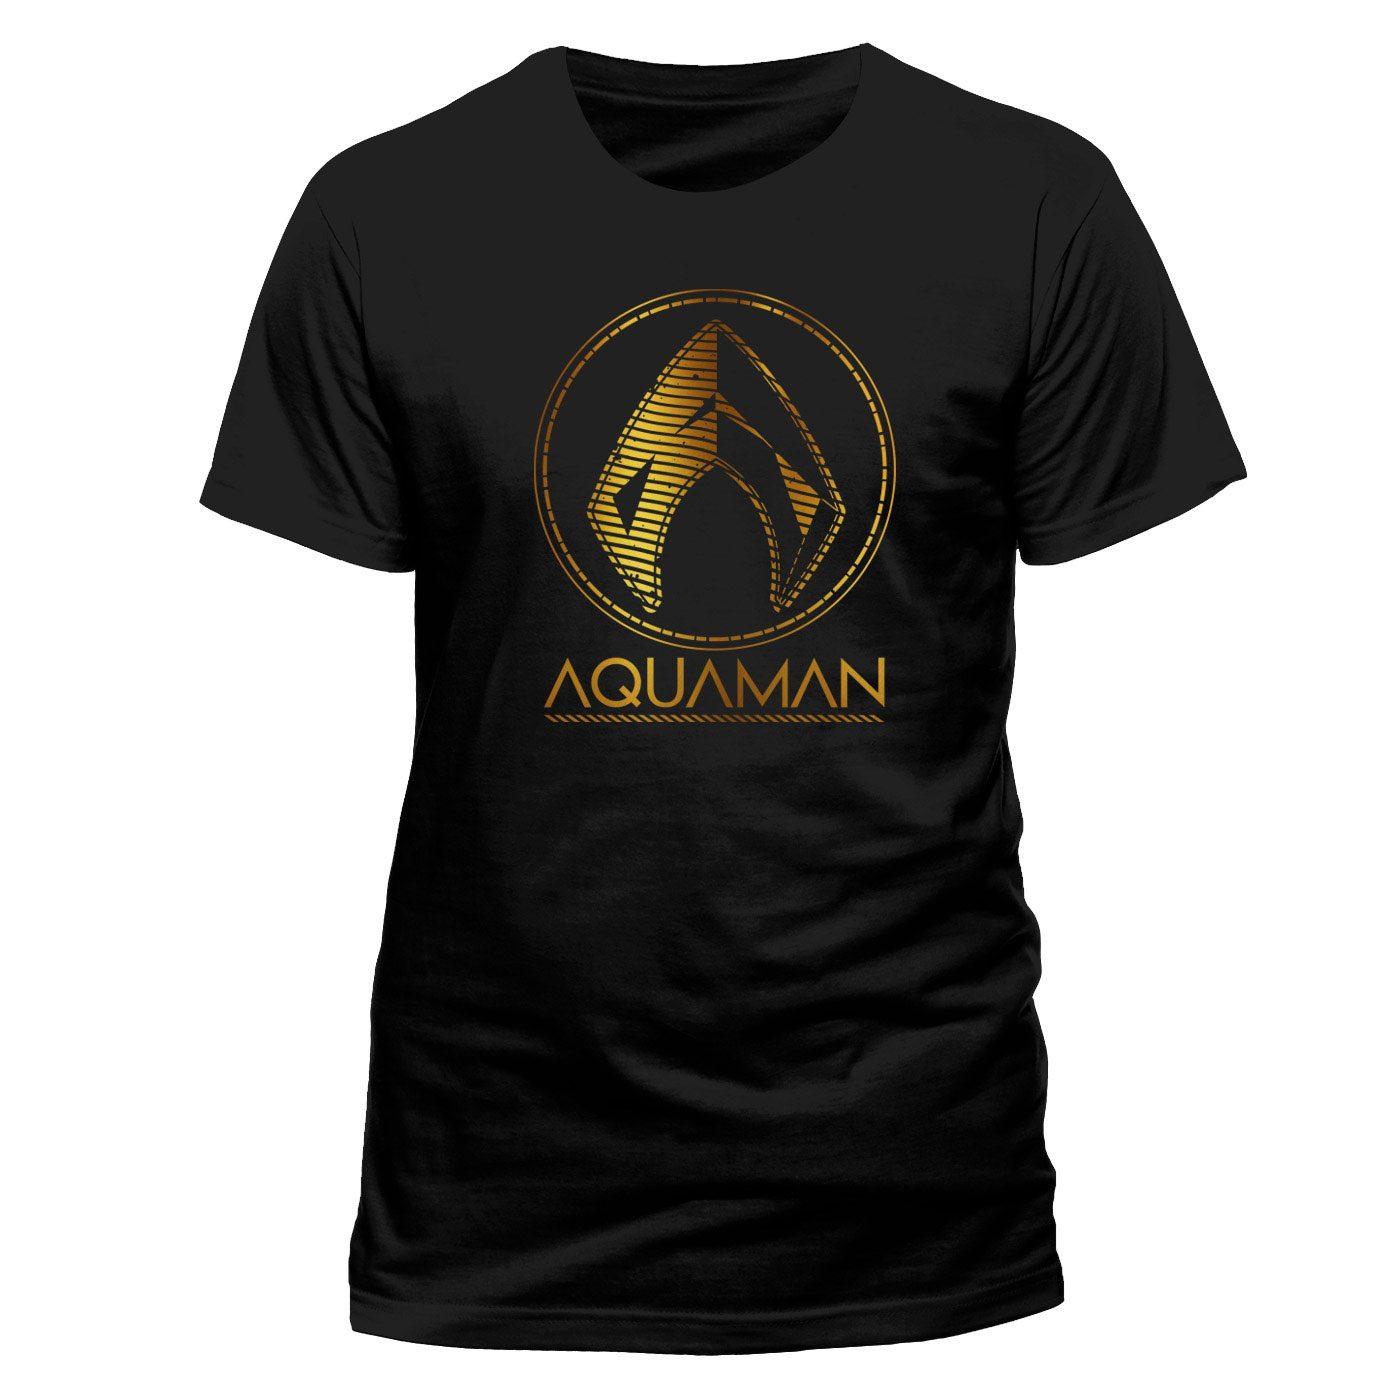 Aquaman Movie T-Shirt Metallic Symbol Size L